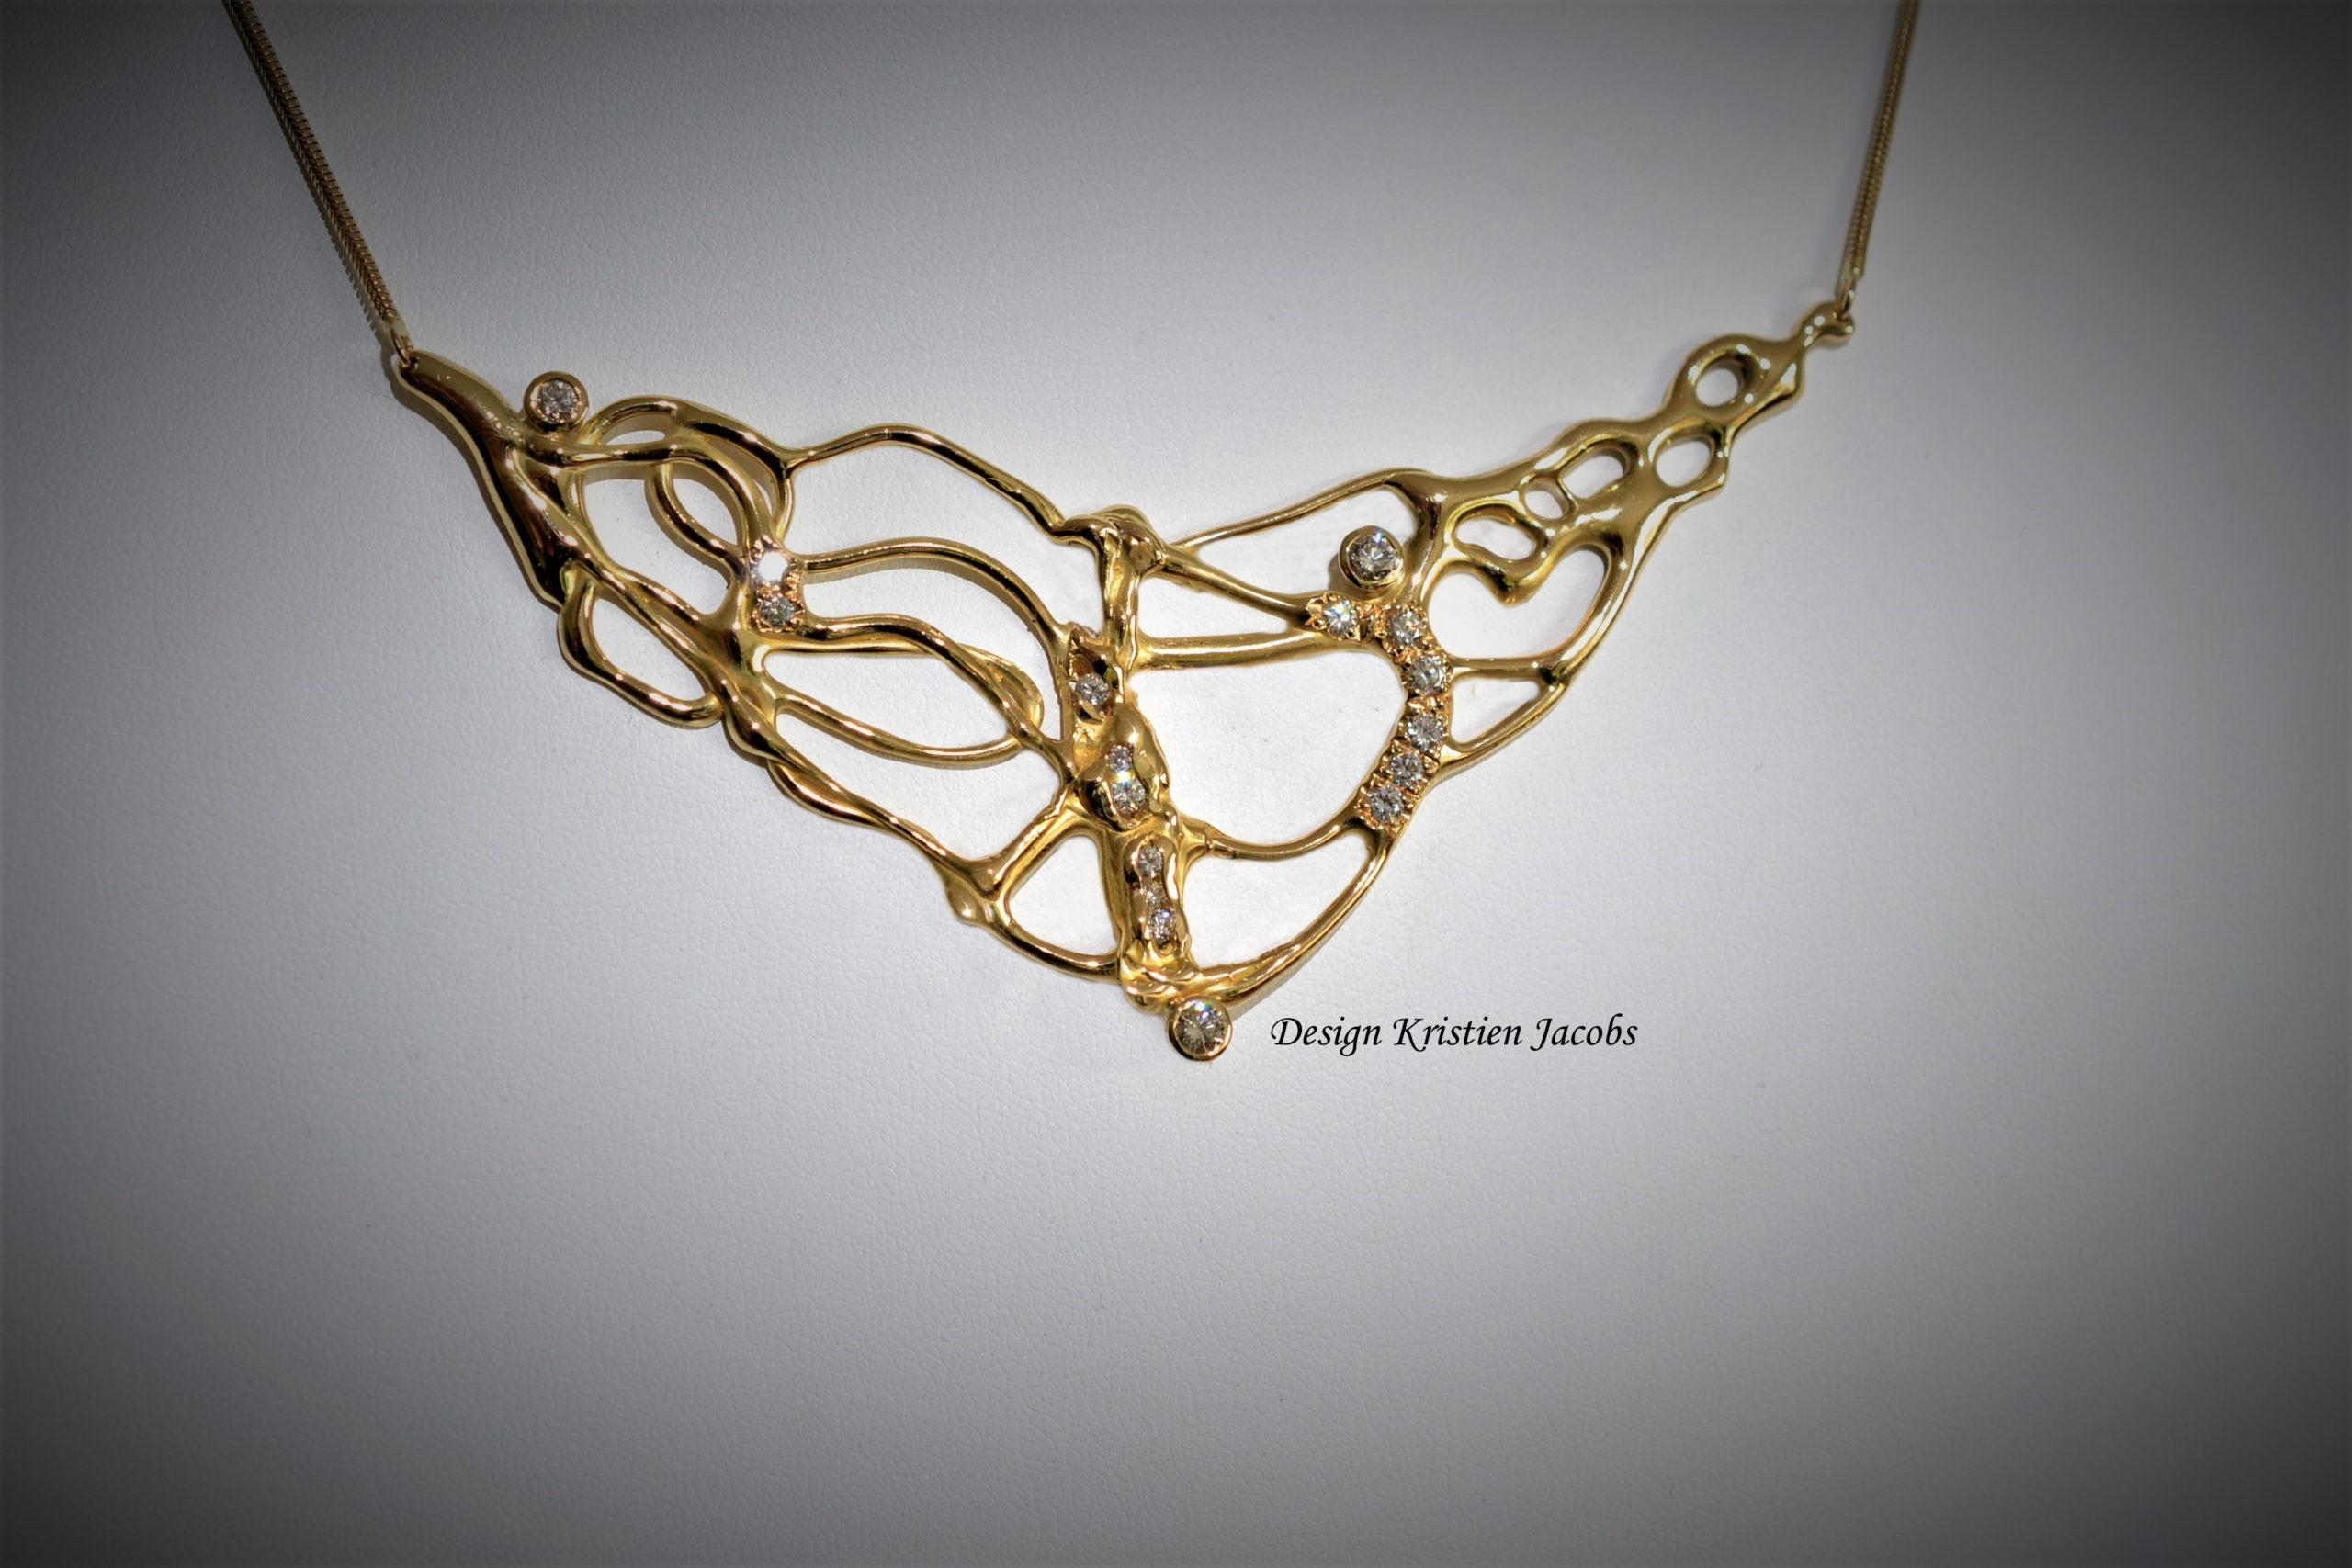 Halsketting oud goud briljant recyclage handgemaakt in eigen atelier te Mechelen